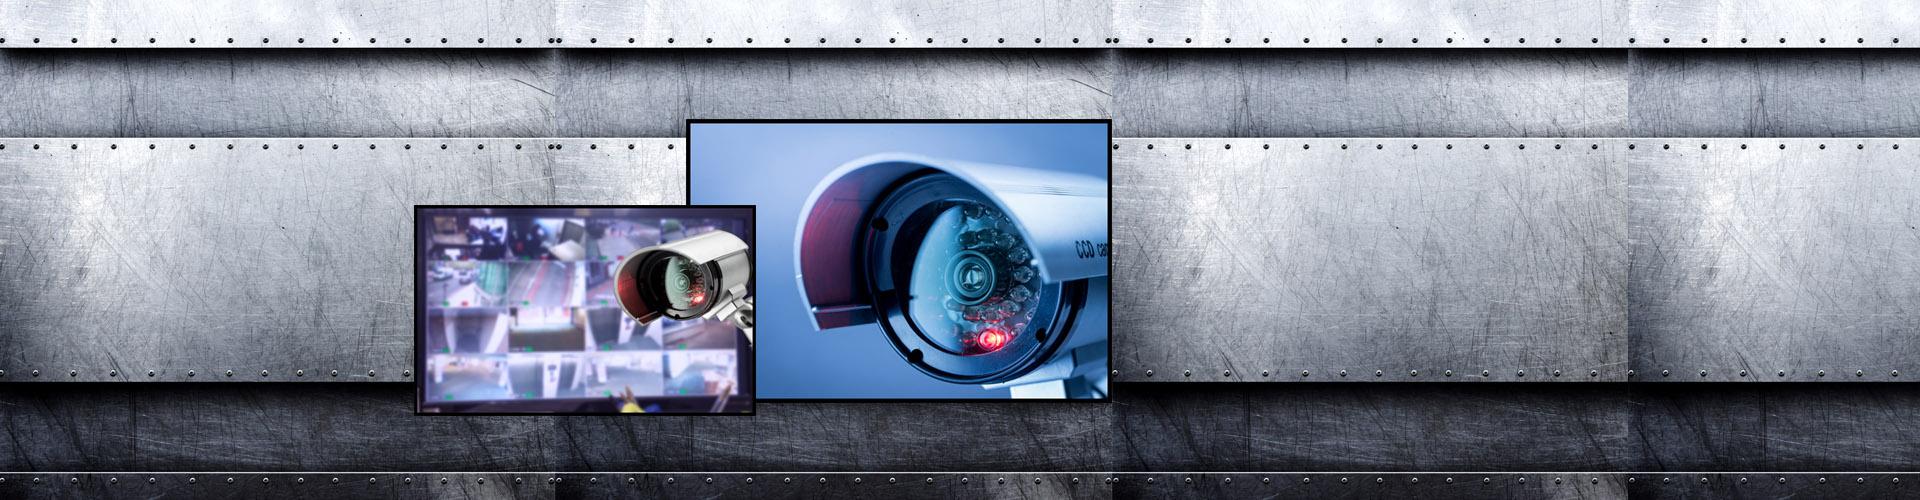 Y SECURE _ CCTV BANNER